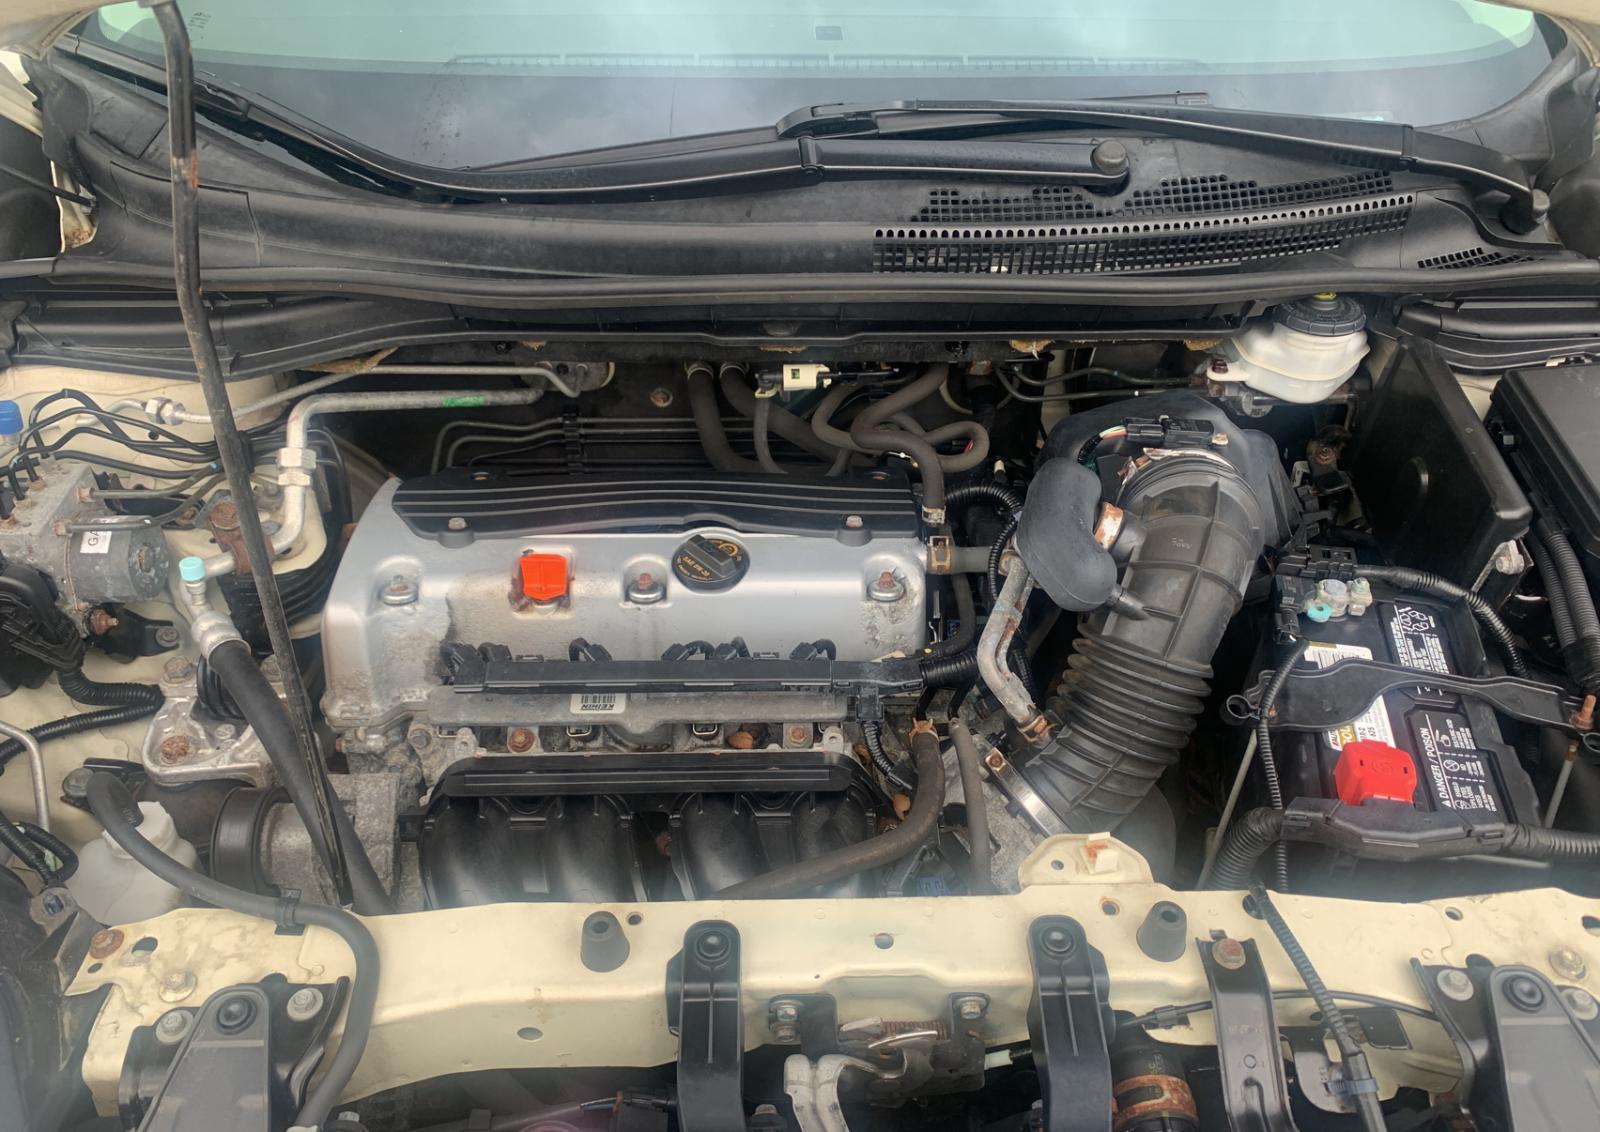 2013 Honda Cr-V Exl 2.4L inside view